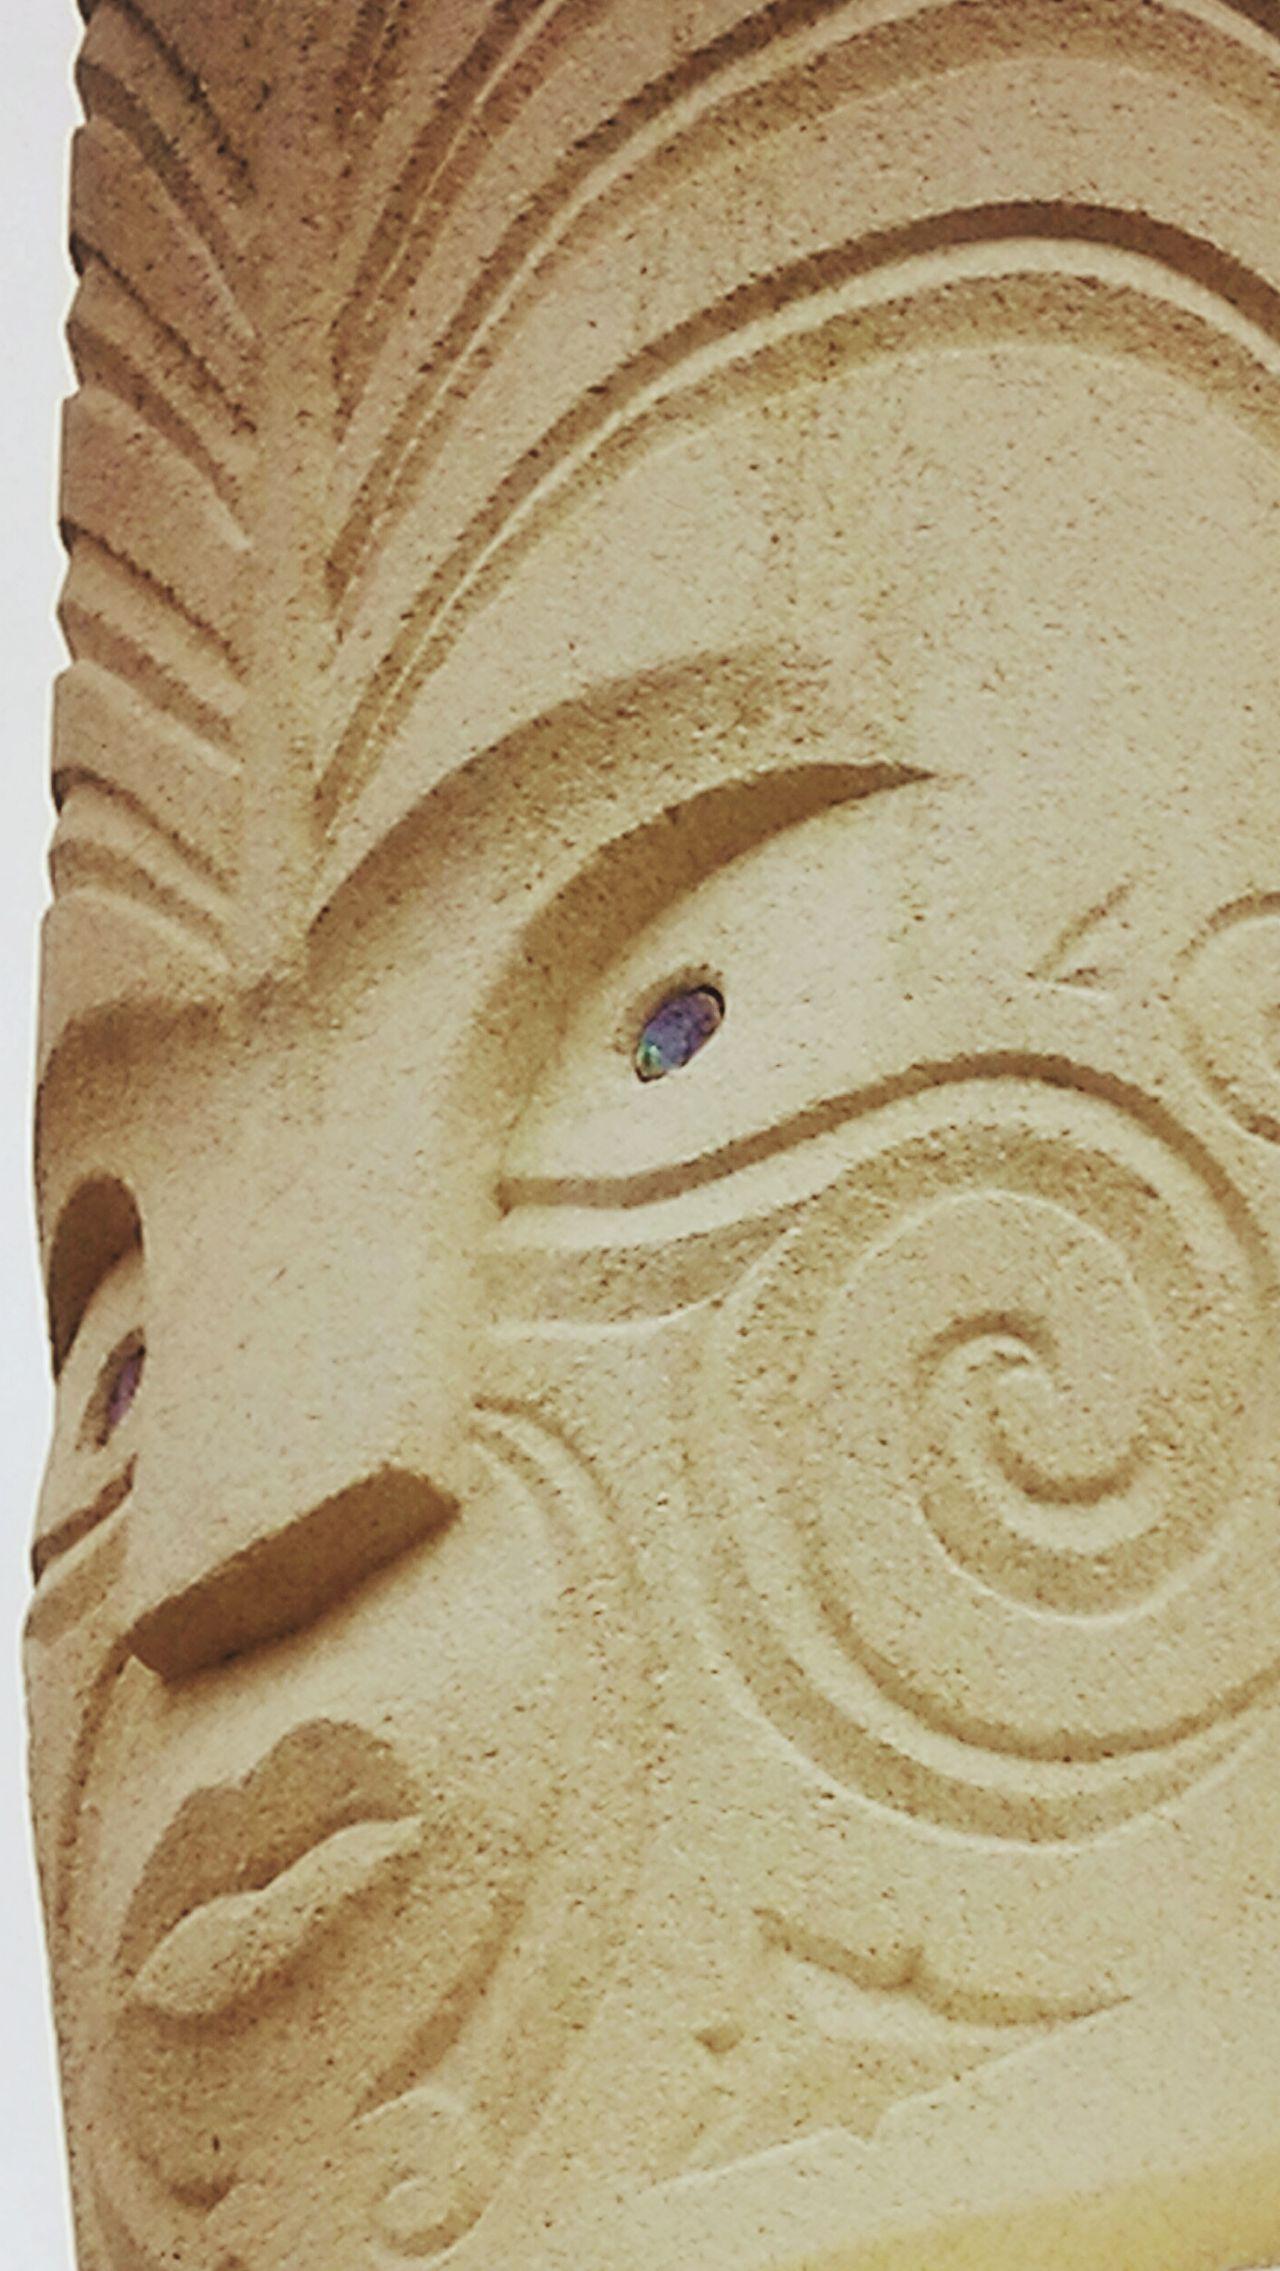 Carving Sculpture Ngati Toa Porirua New Zealand Guardian Ancestor Sand No People Backgrounds Beach Nature Architecture Close-up Day Outdoors